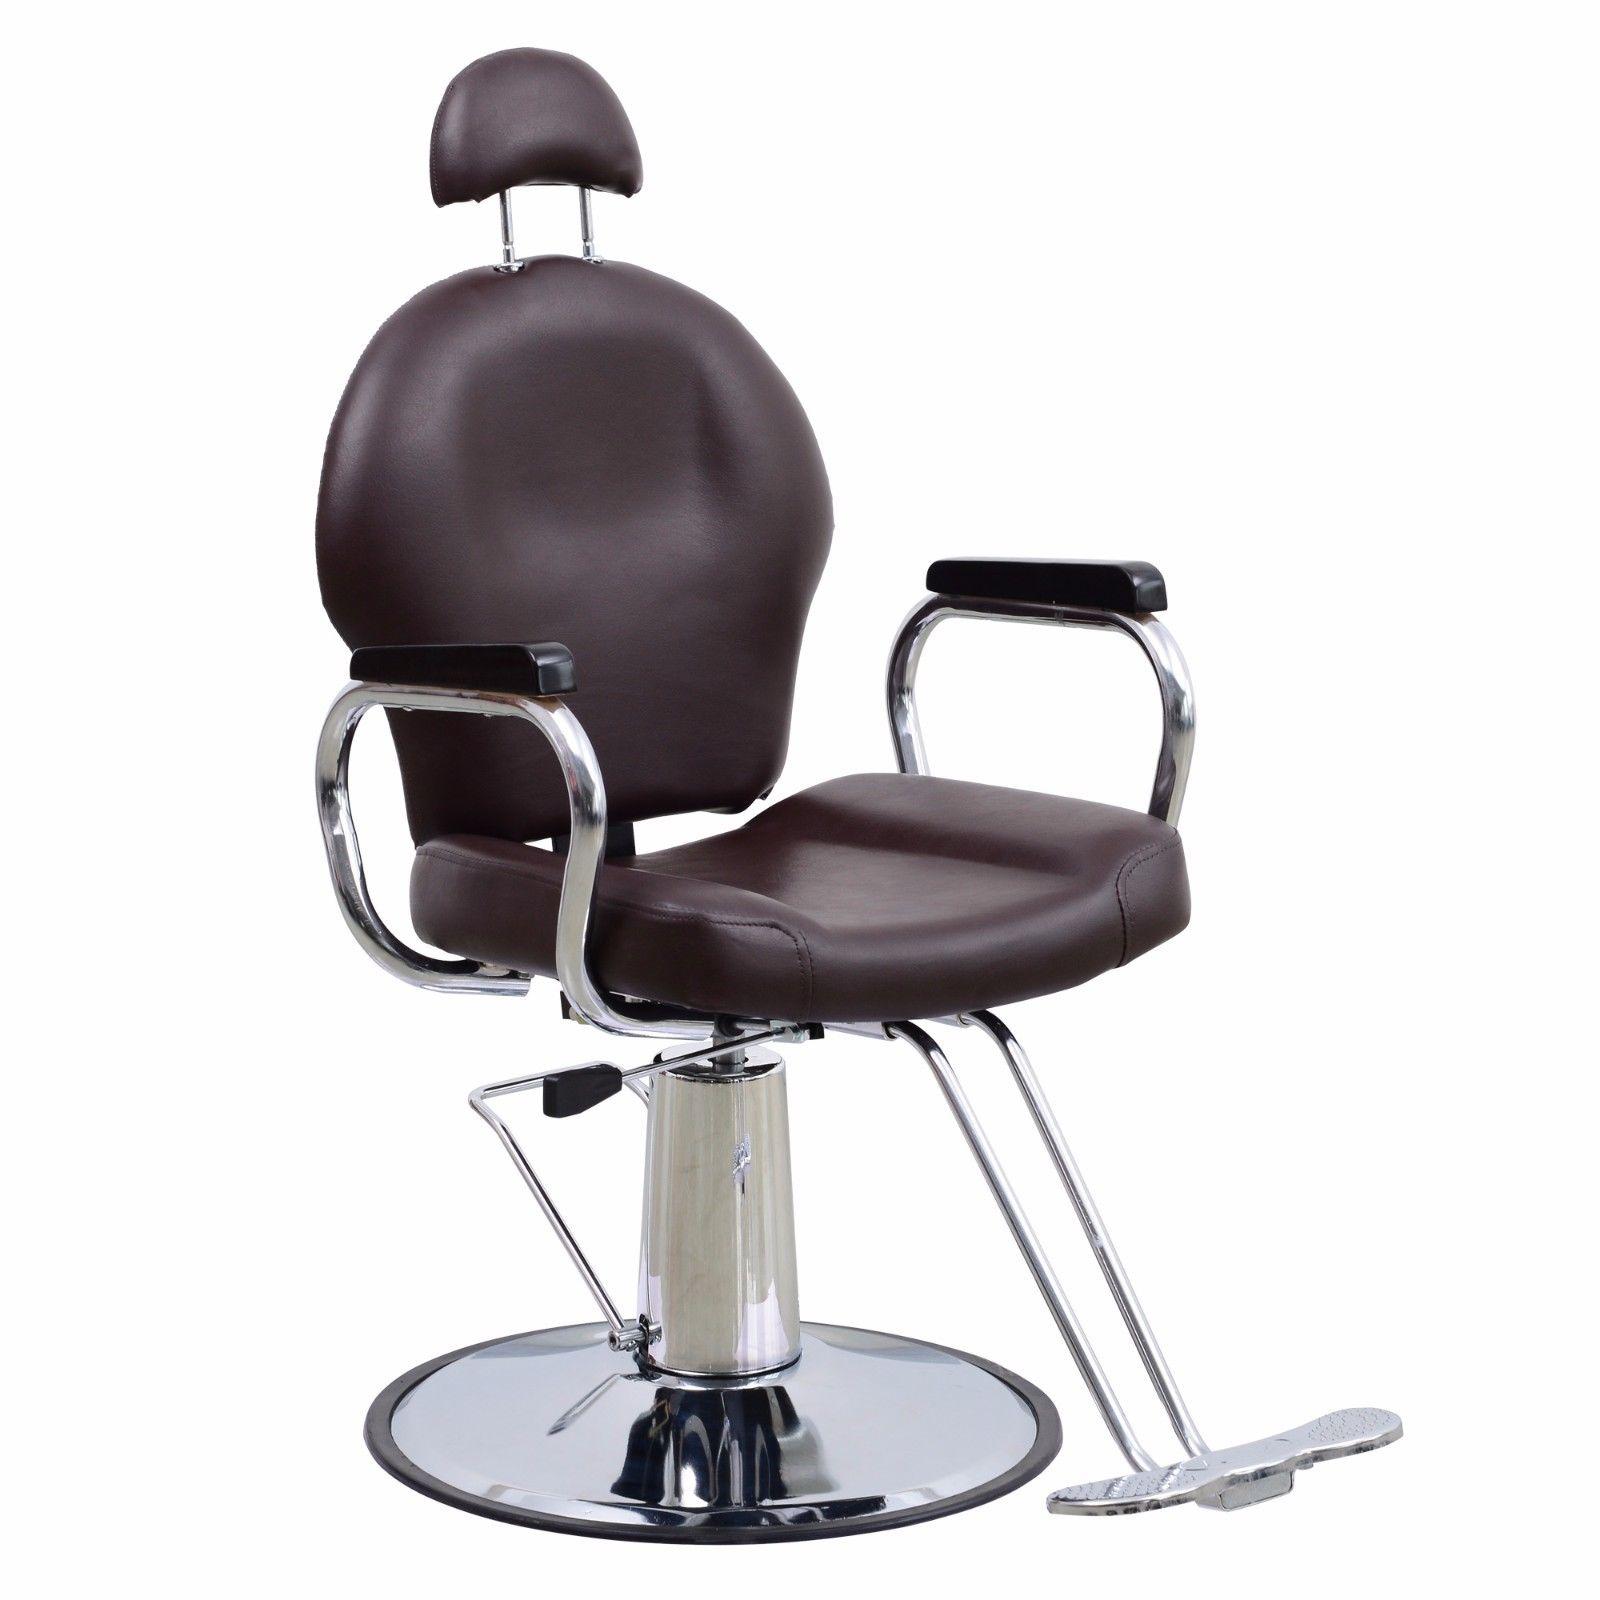 Reclining Barber Chair Hydraulic Salon Styling Beauty Spa